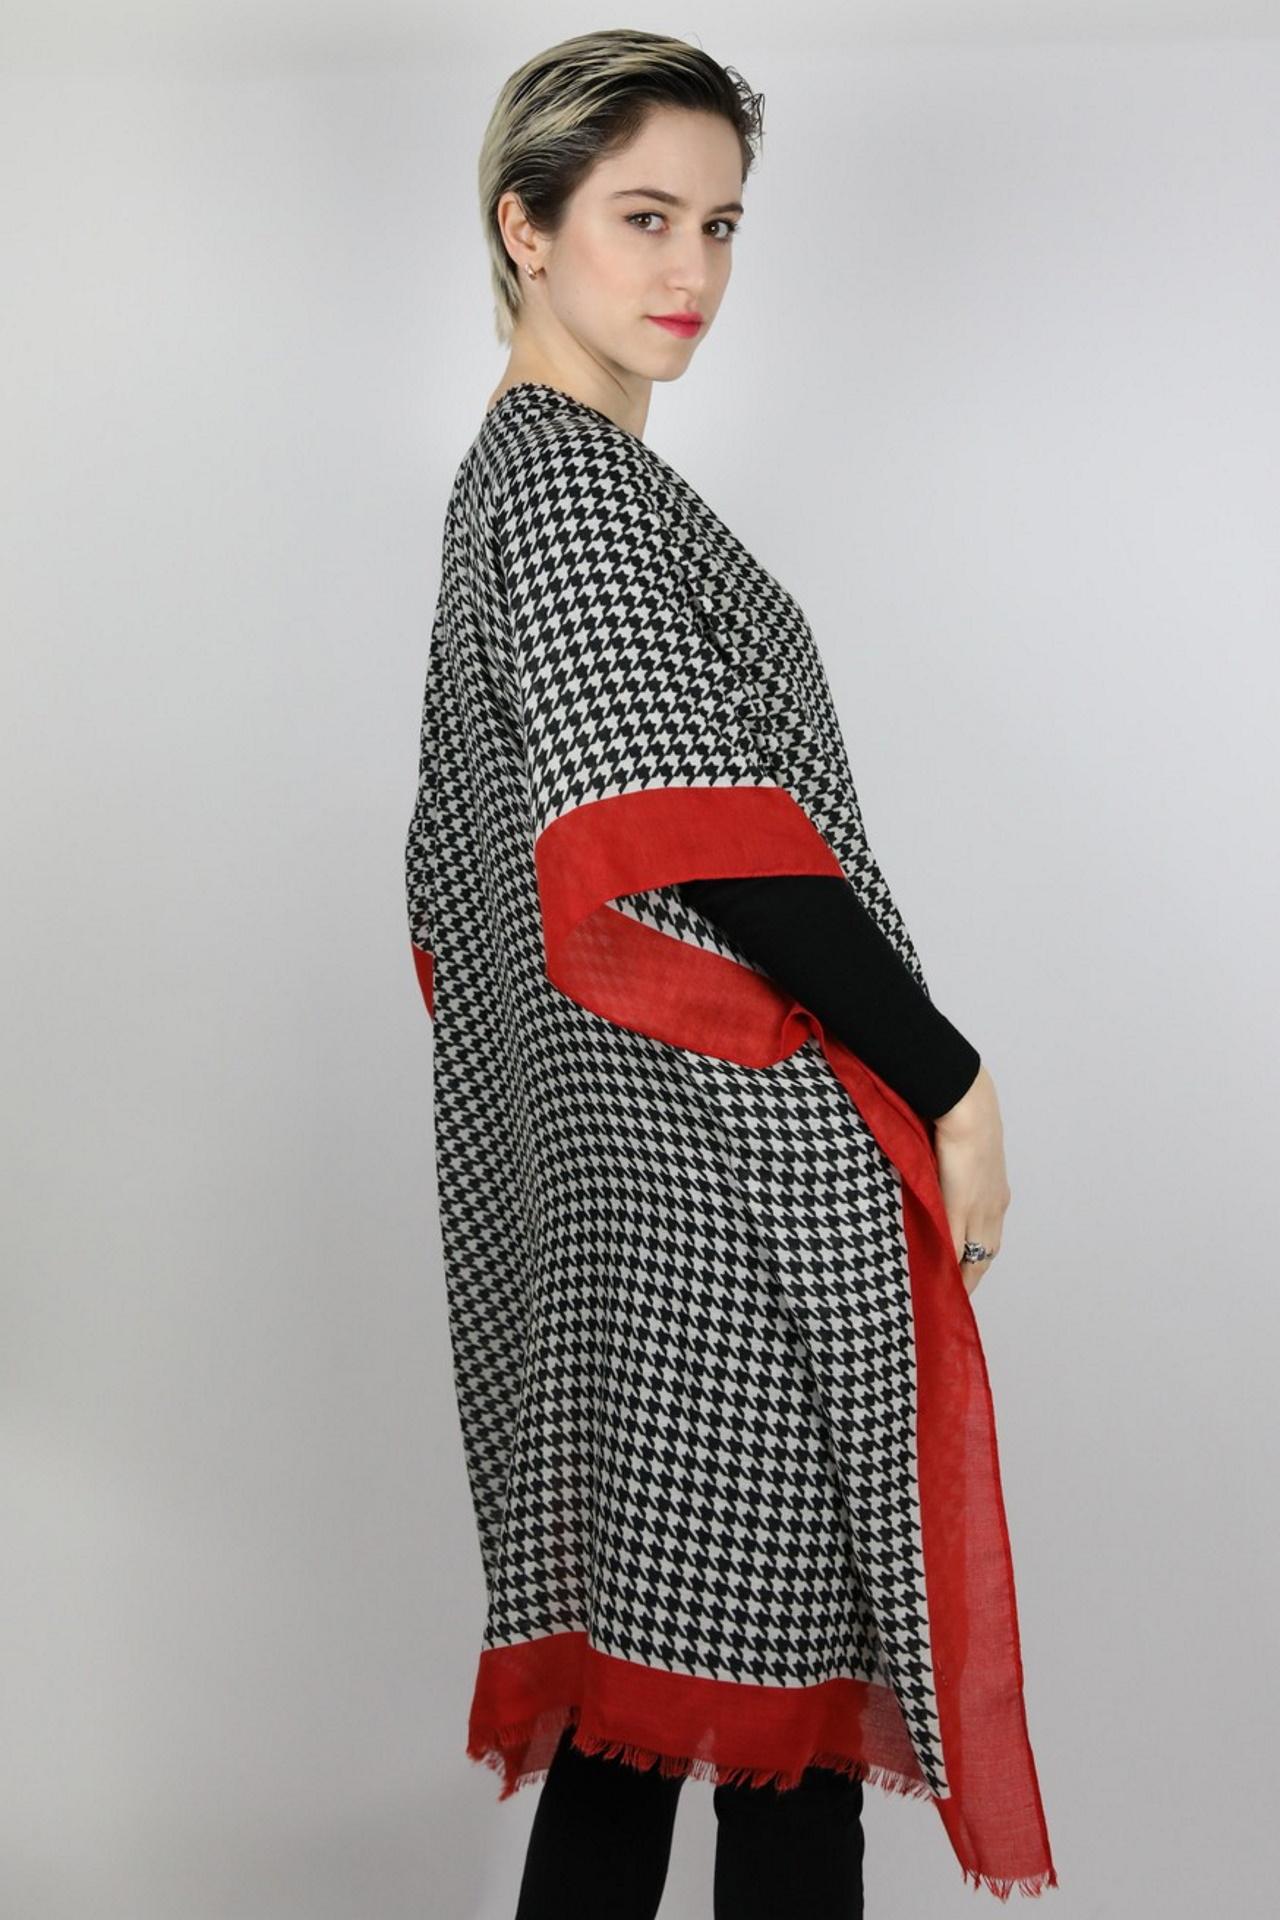 CLOTHES05 STOLA DONNA FOULARD CARDIGAN COPRISPALLE 3 1stAmerican elegante stola da donna foulard cardigan coprispalle